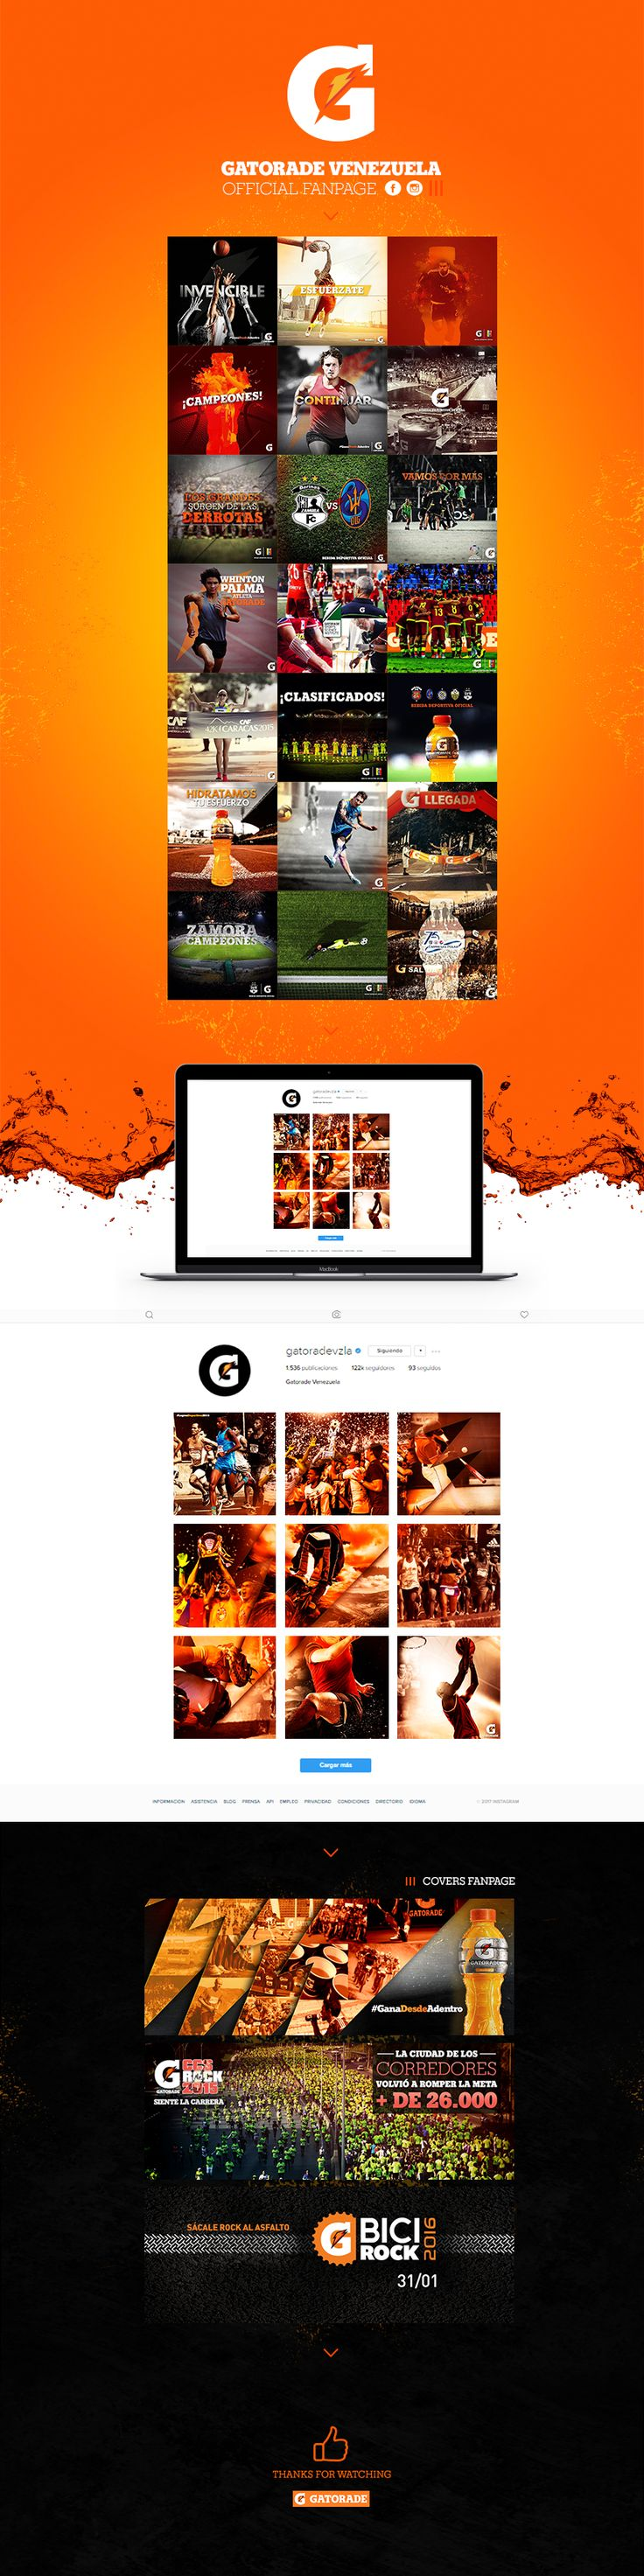 Confira este projeto do @Behance: \u201cGatorade Venezuela - Mashup Interactive Agency\u201d https://www.behance.net/gallery/48957725/Gatorade-Venezuela-Mashup-Interactive-Agency